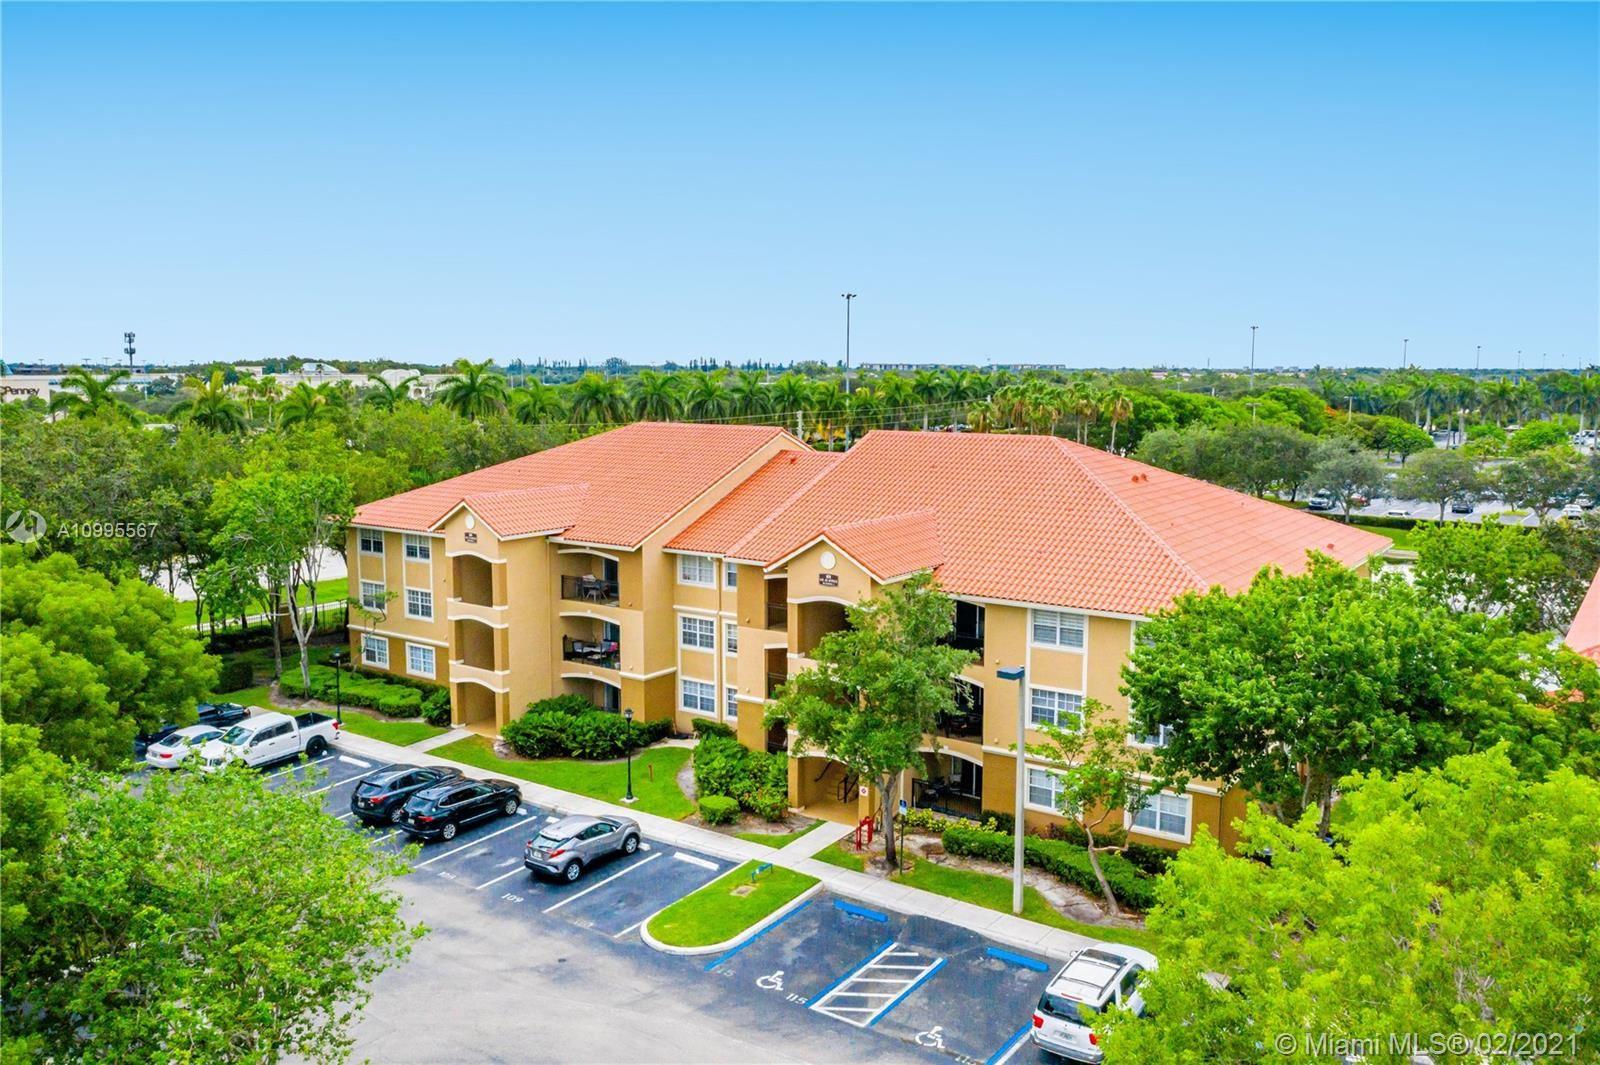 101 SW 117th Ave #7102, Pembroke Pines, FL 33025 - #: A10995567